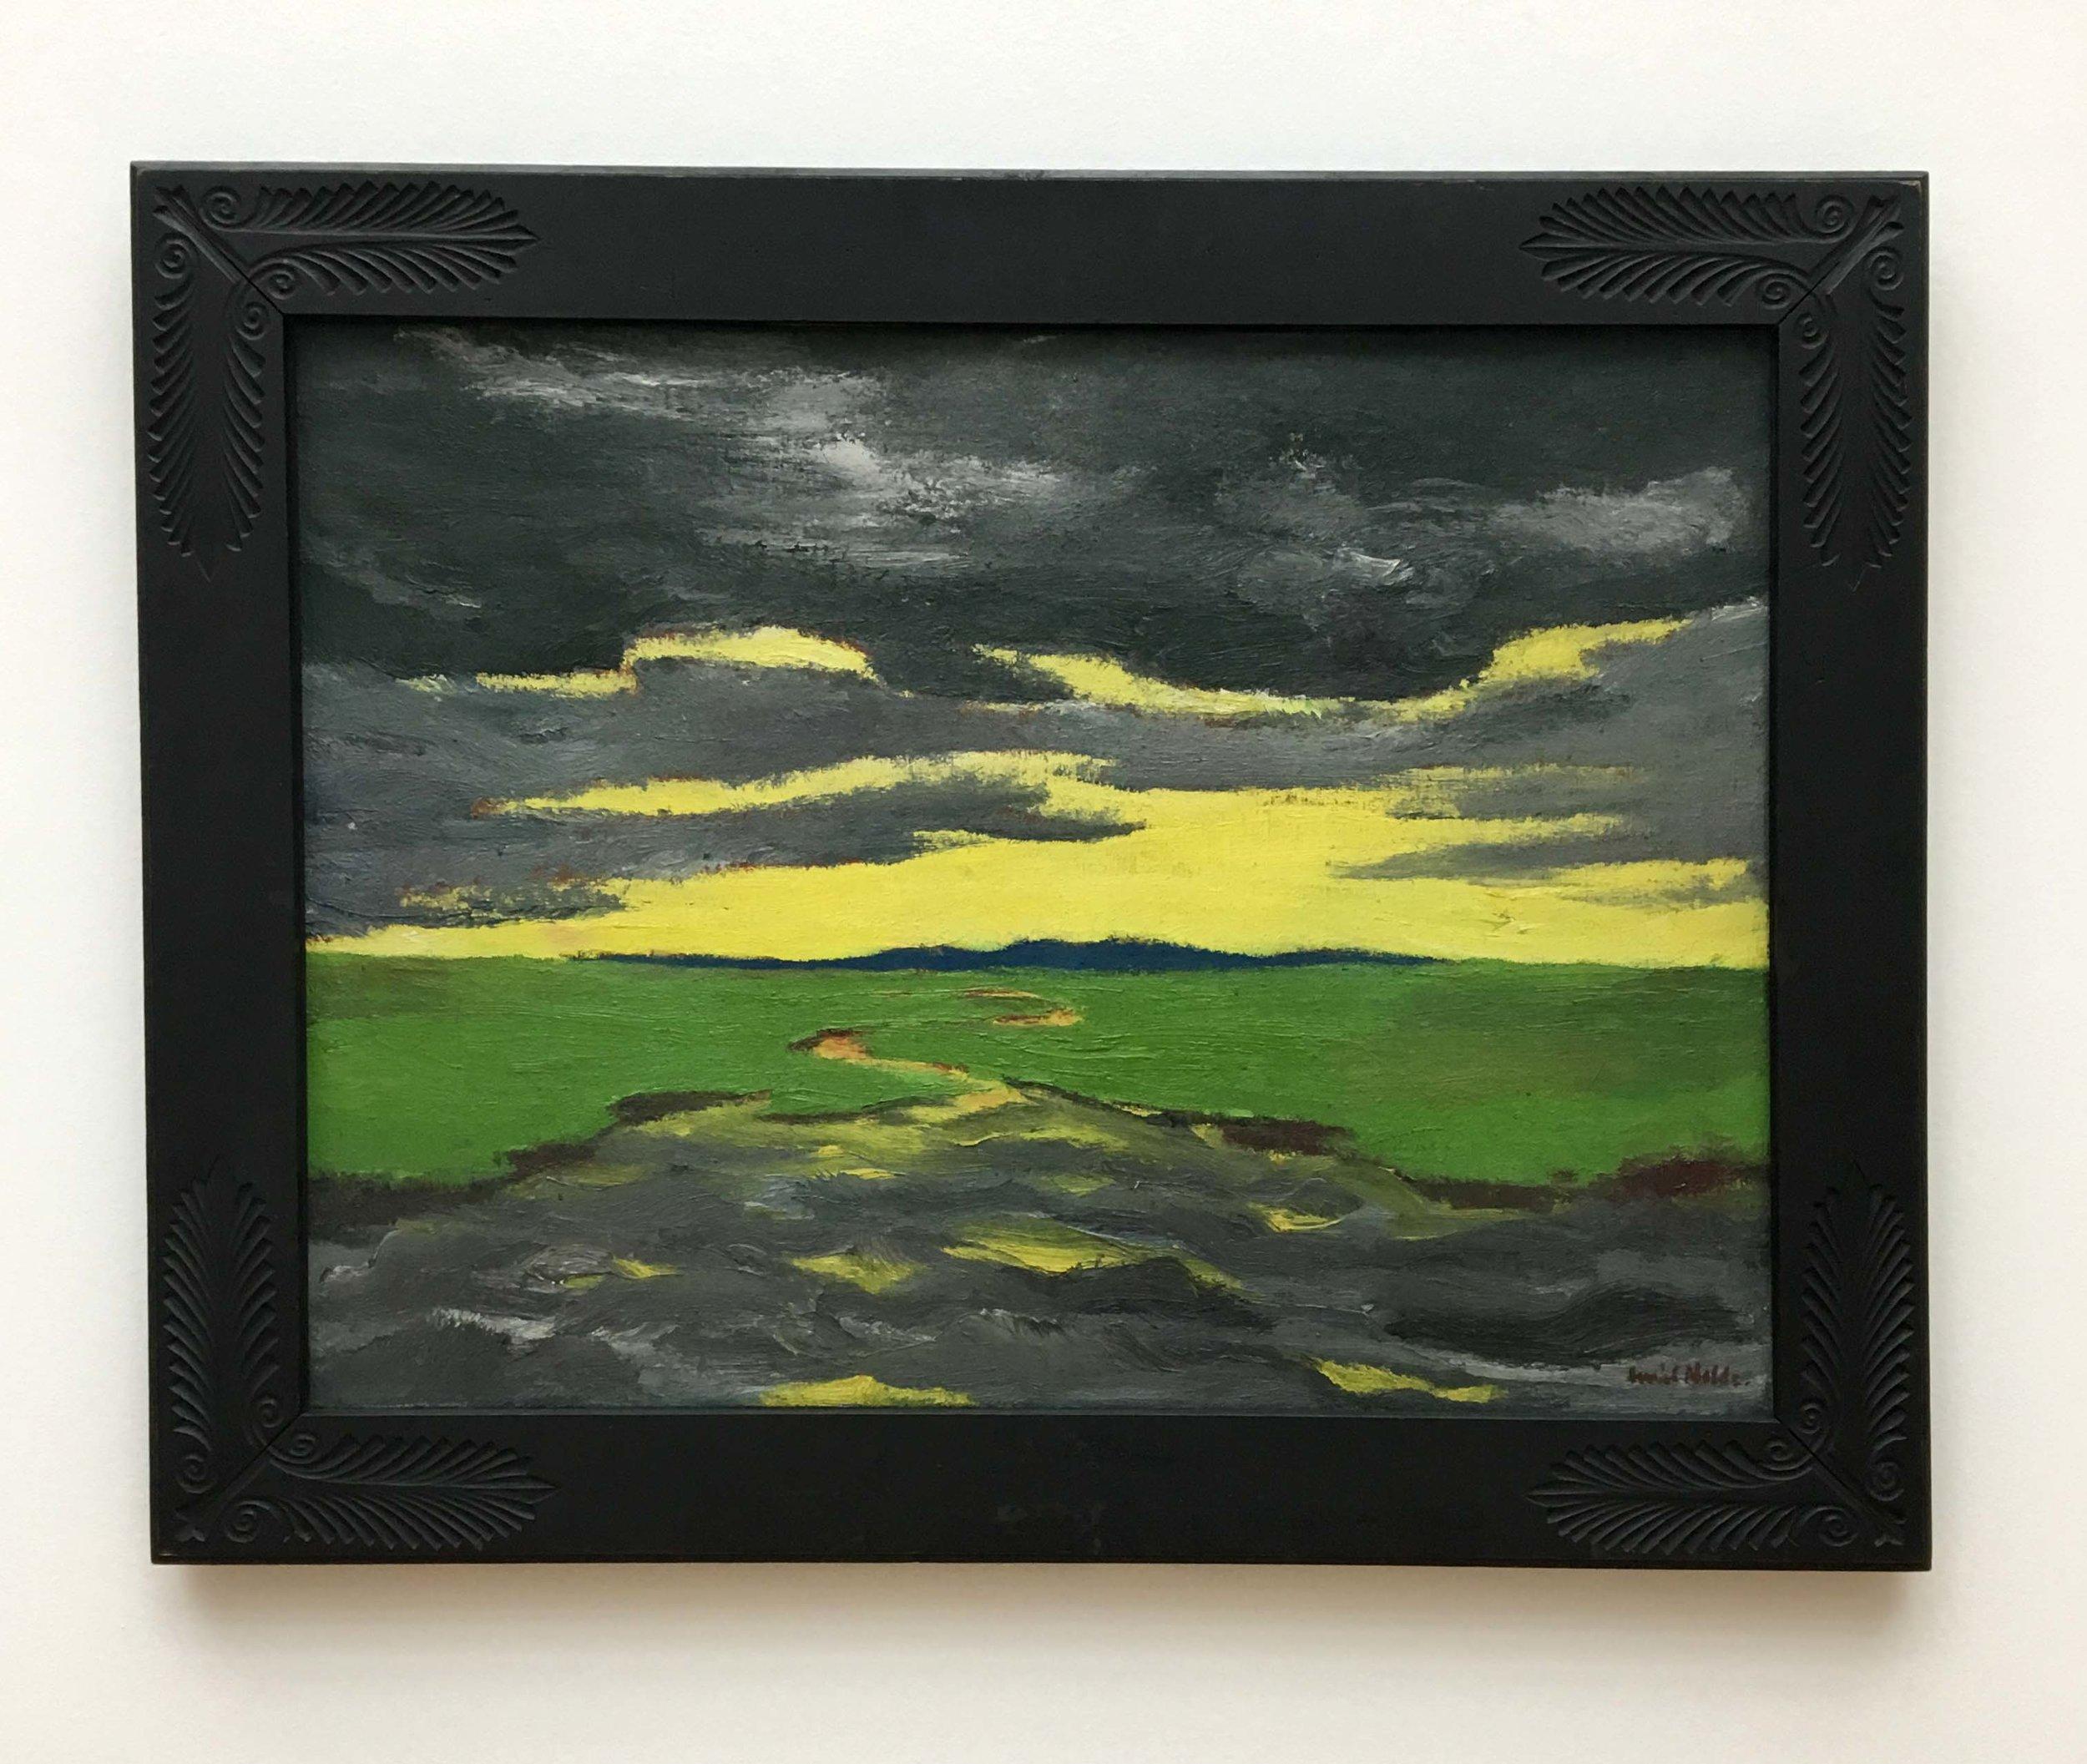 Emil Nolde, Twilight (Marsh Landscape), 1916